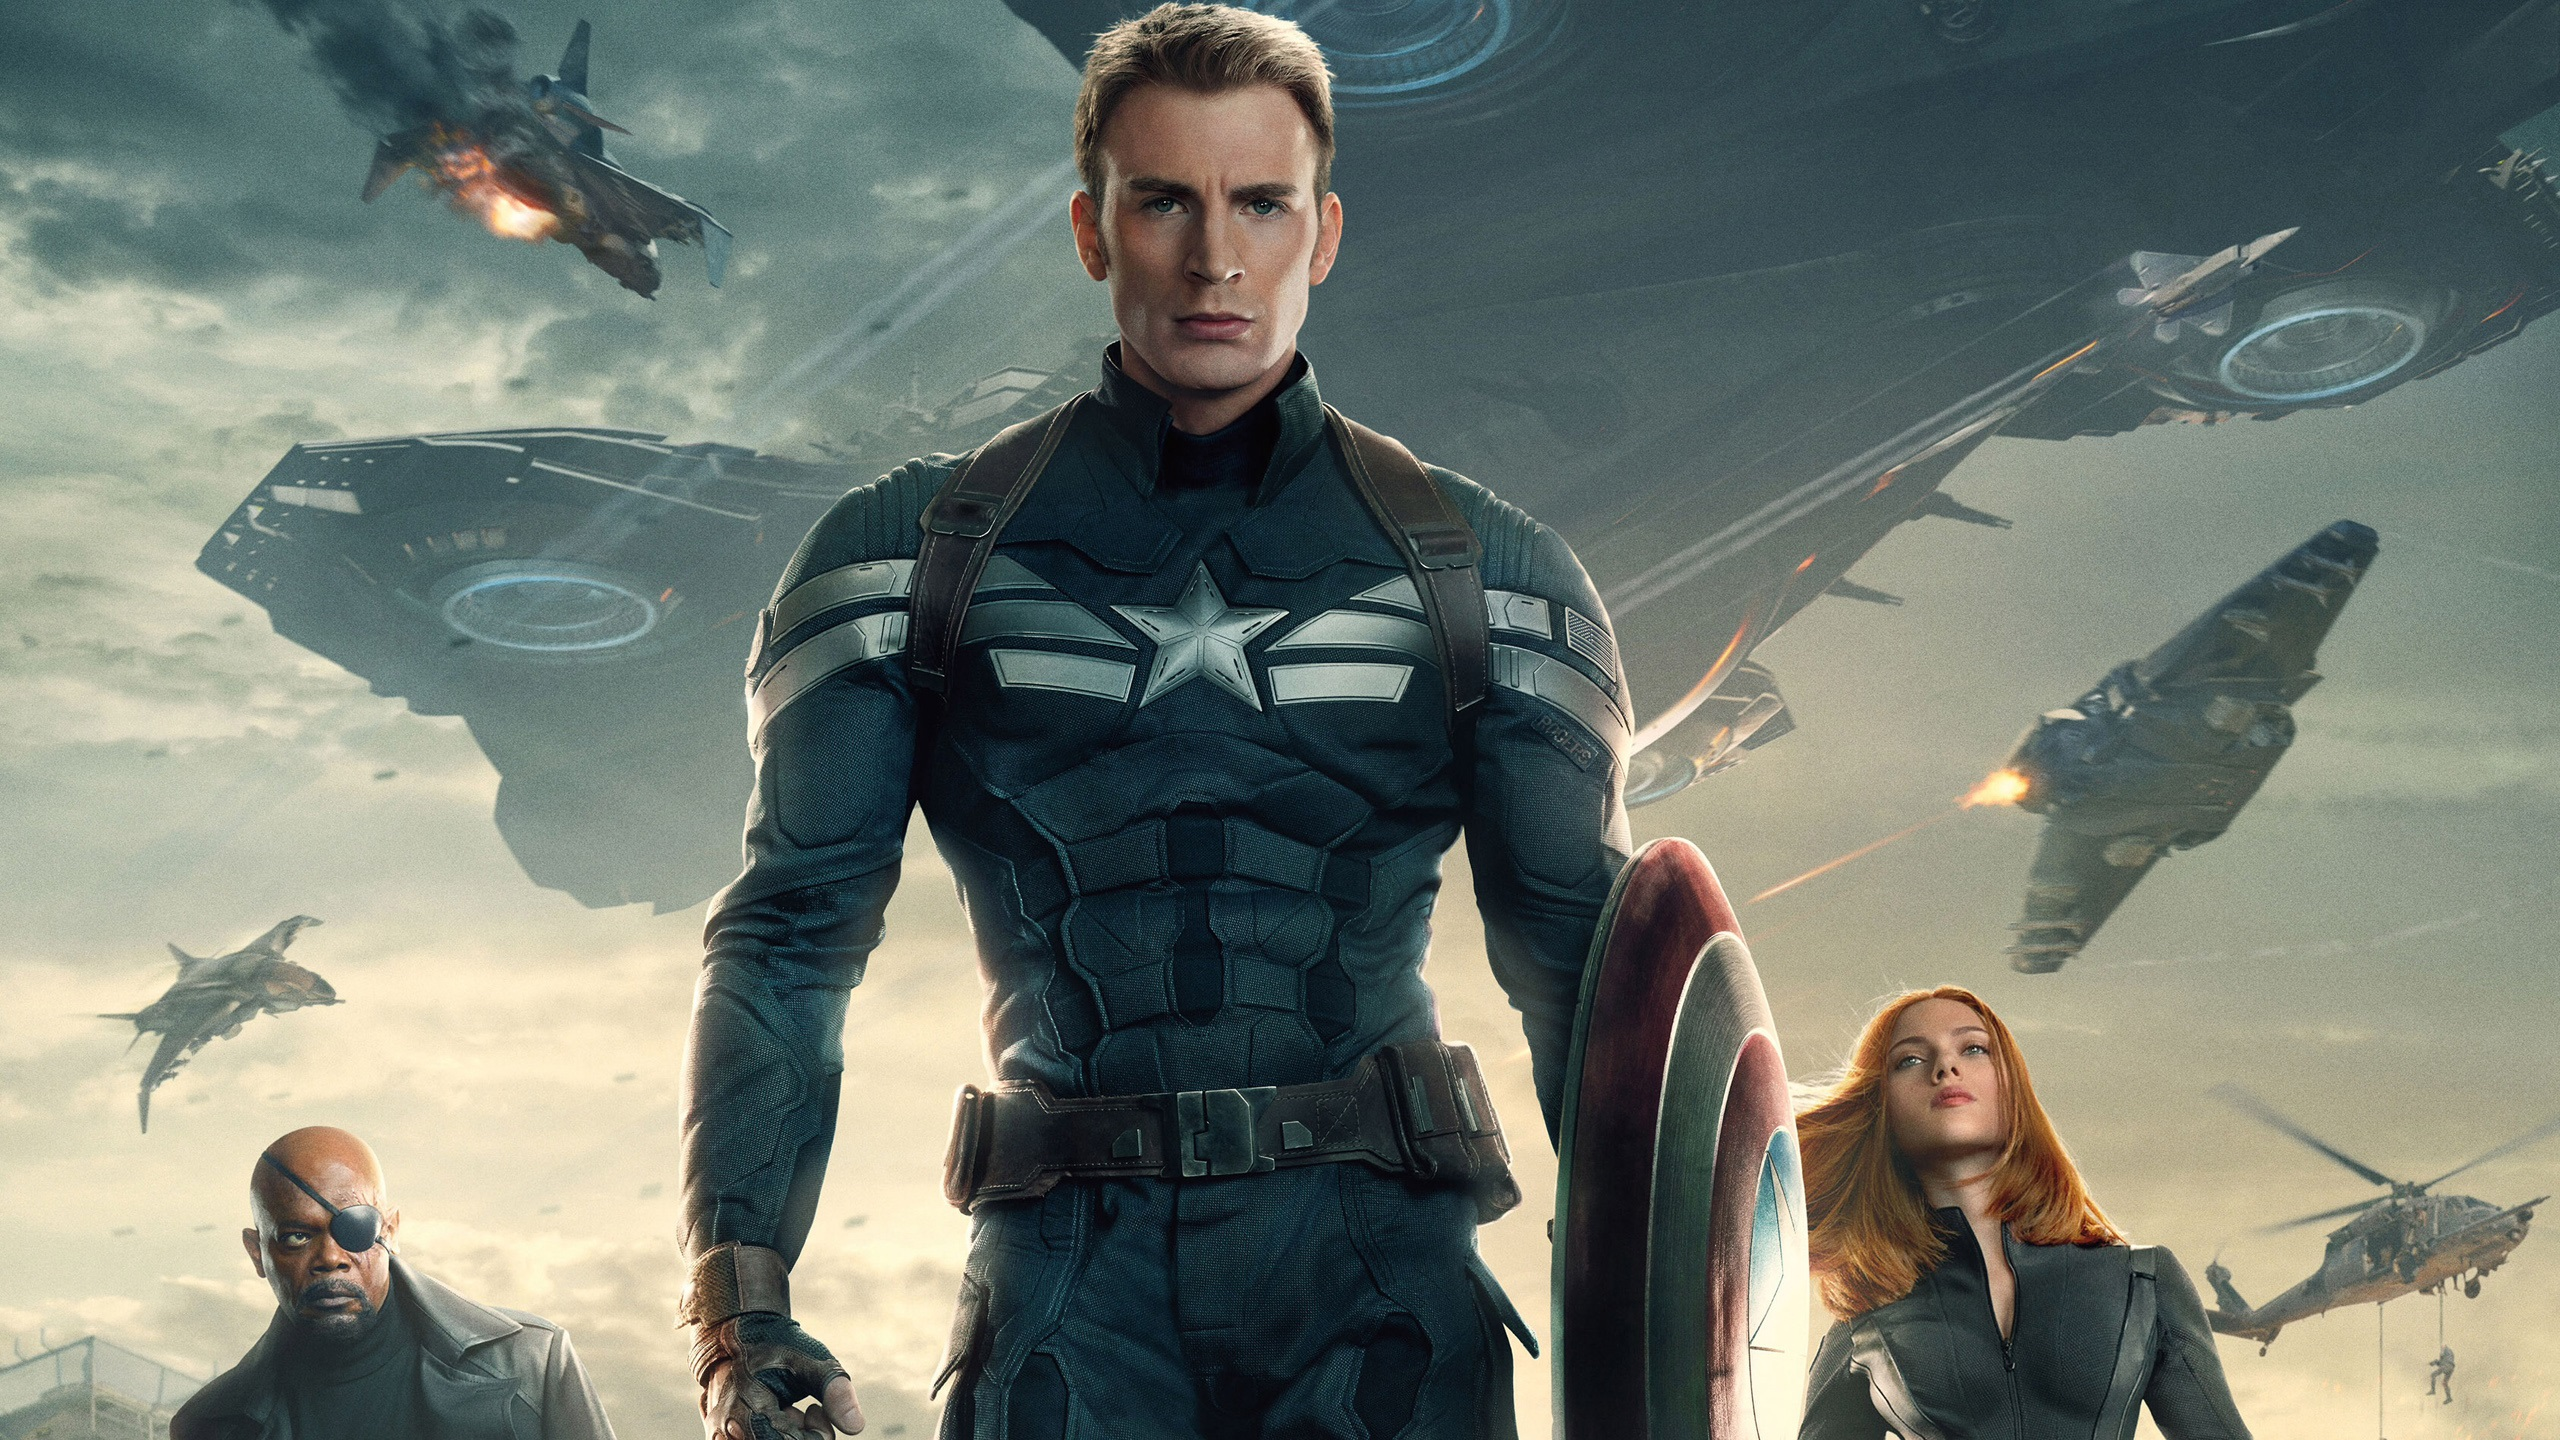 Wallpaper 2014 Captain America The Winter Soldier 2560x1600 Hd